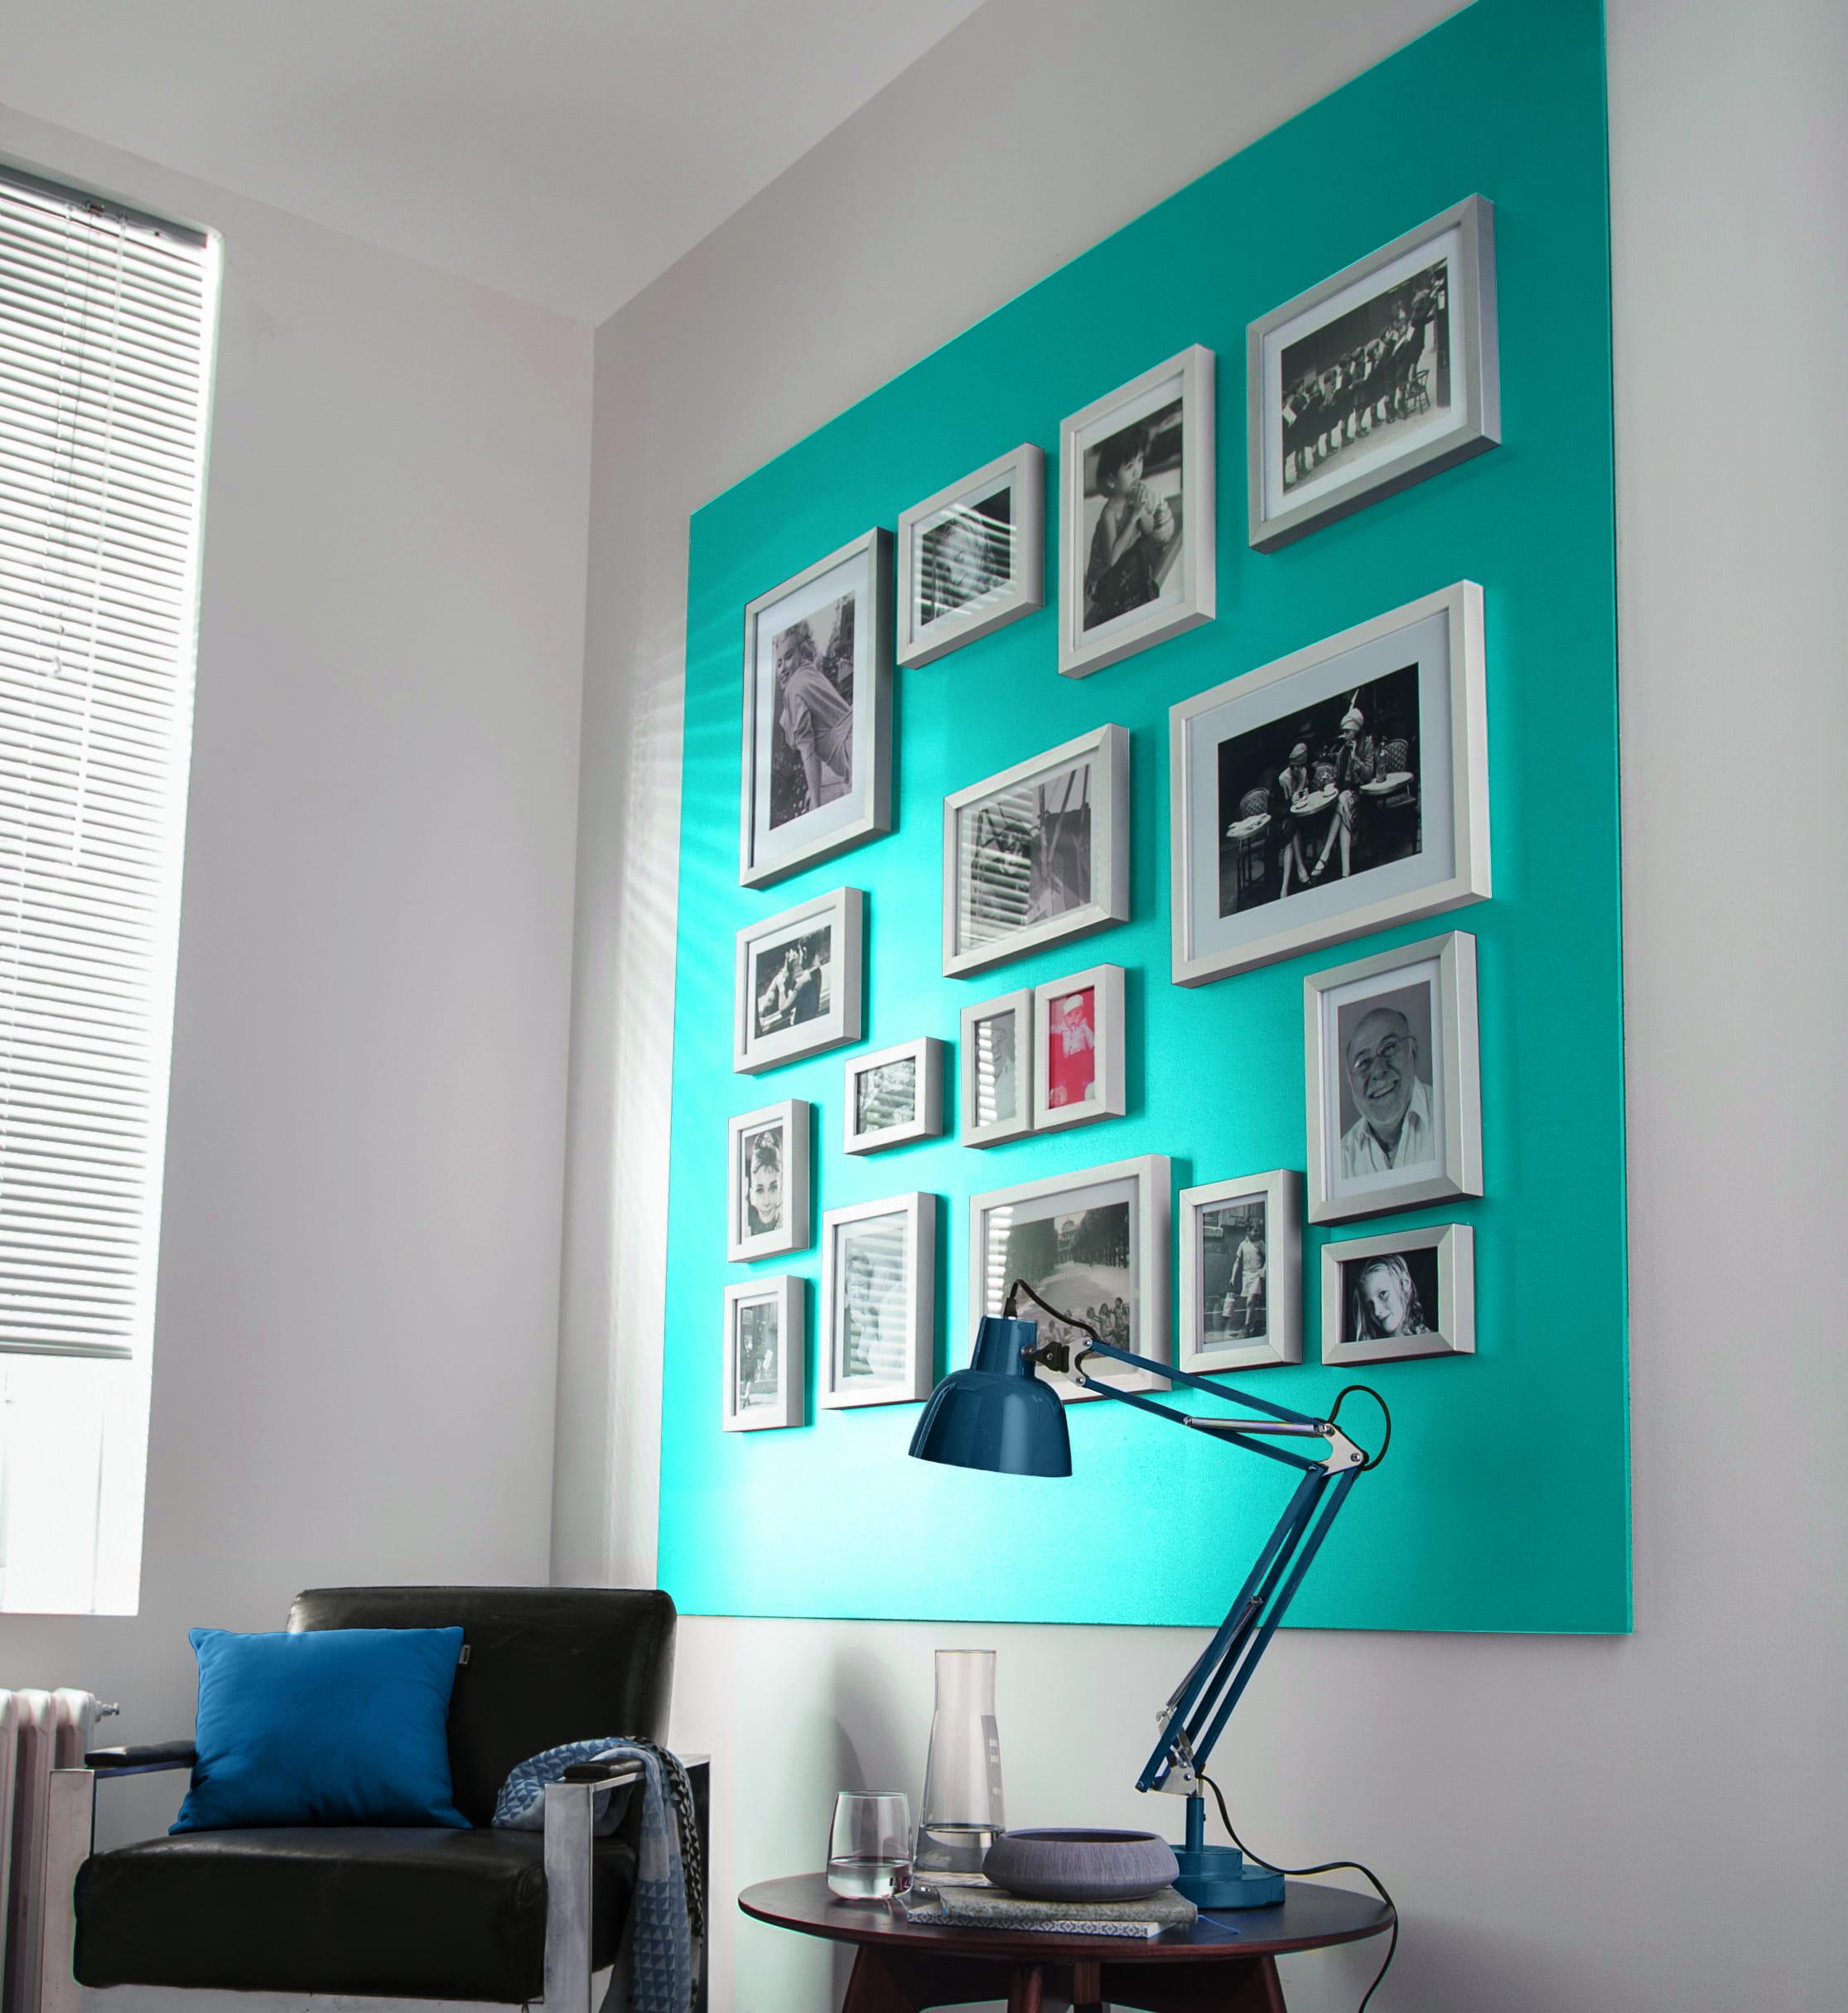 Peinture bleu pacifique par castorama - Peinture acrylique castorama prix ...